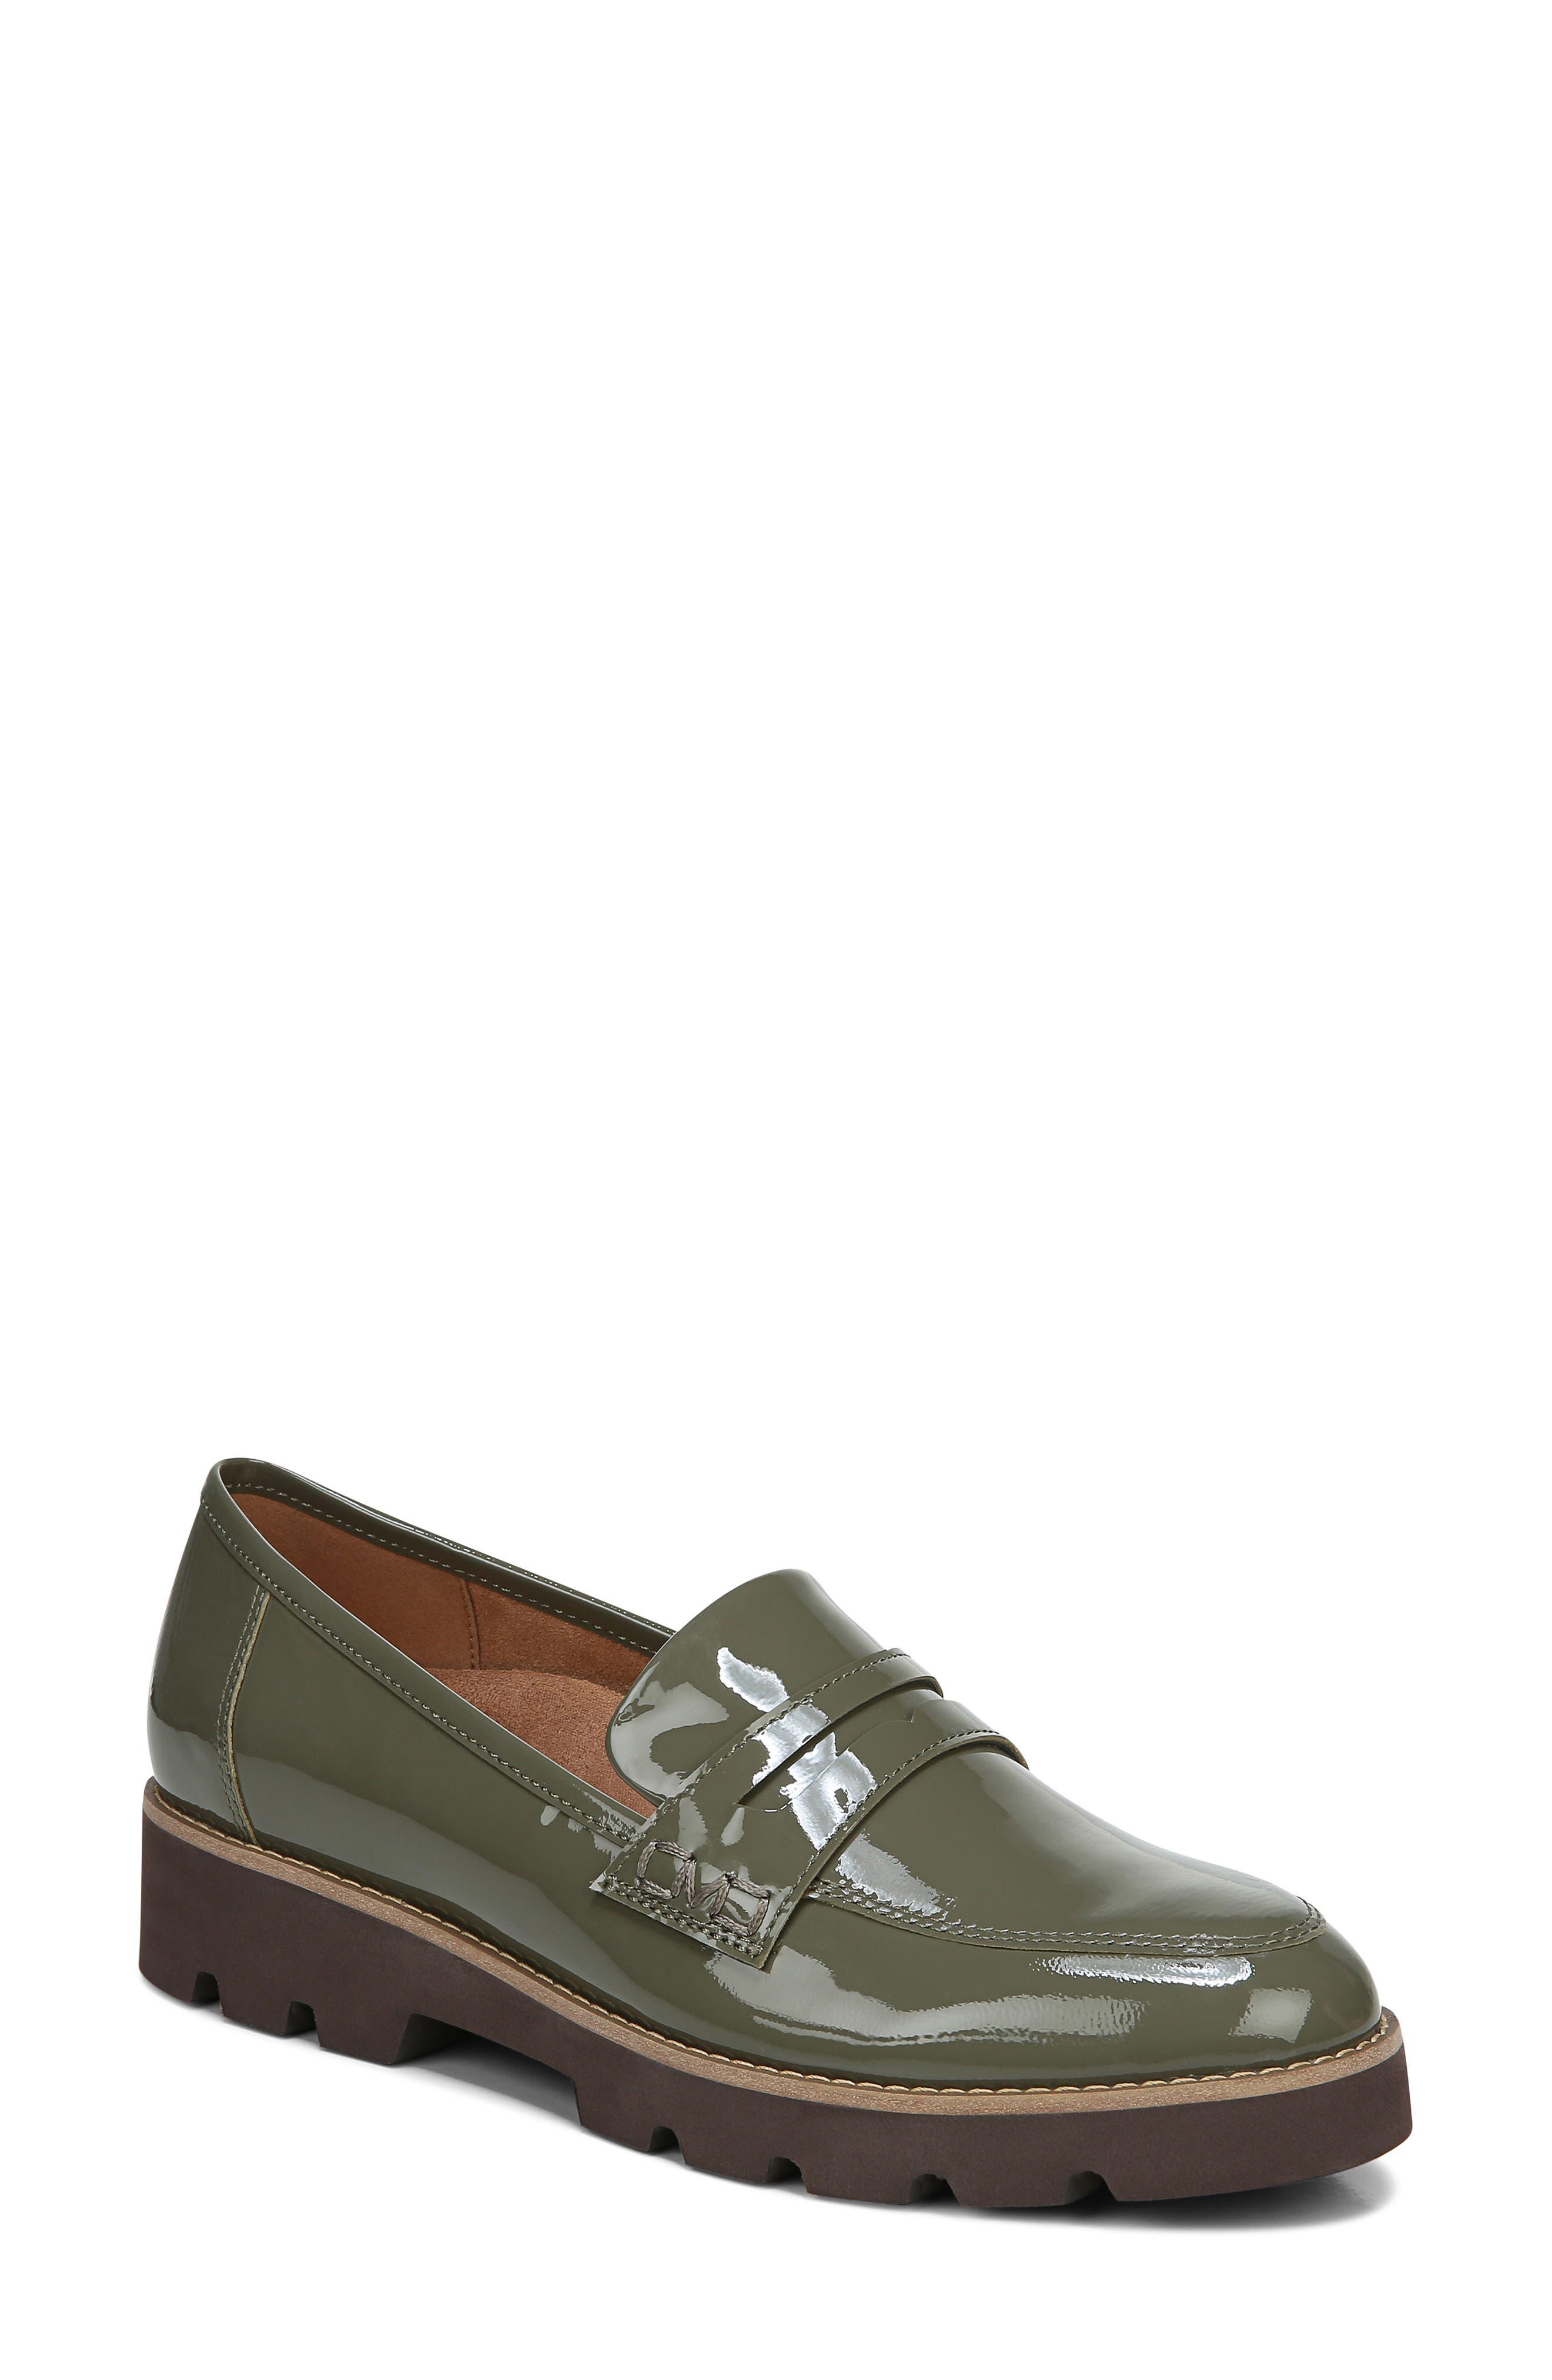 Women's Green Loafers \u0026 Oxfords | Nordstrom